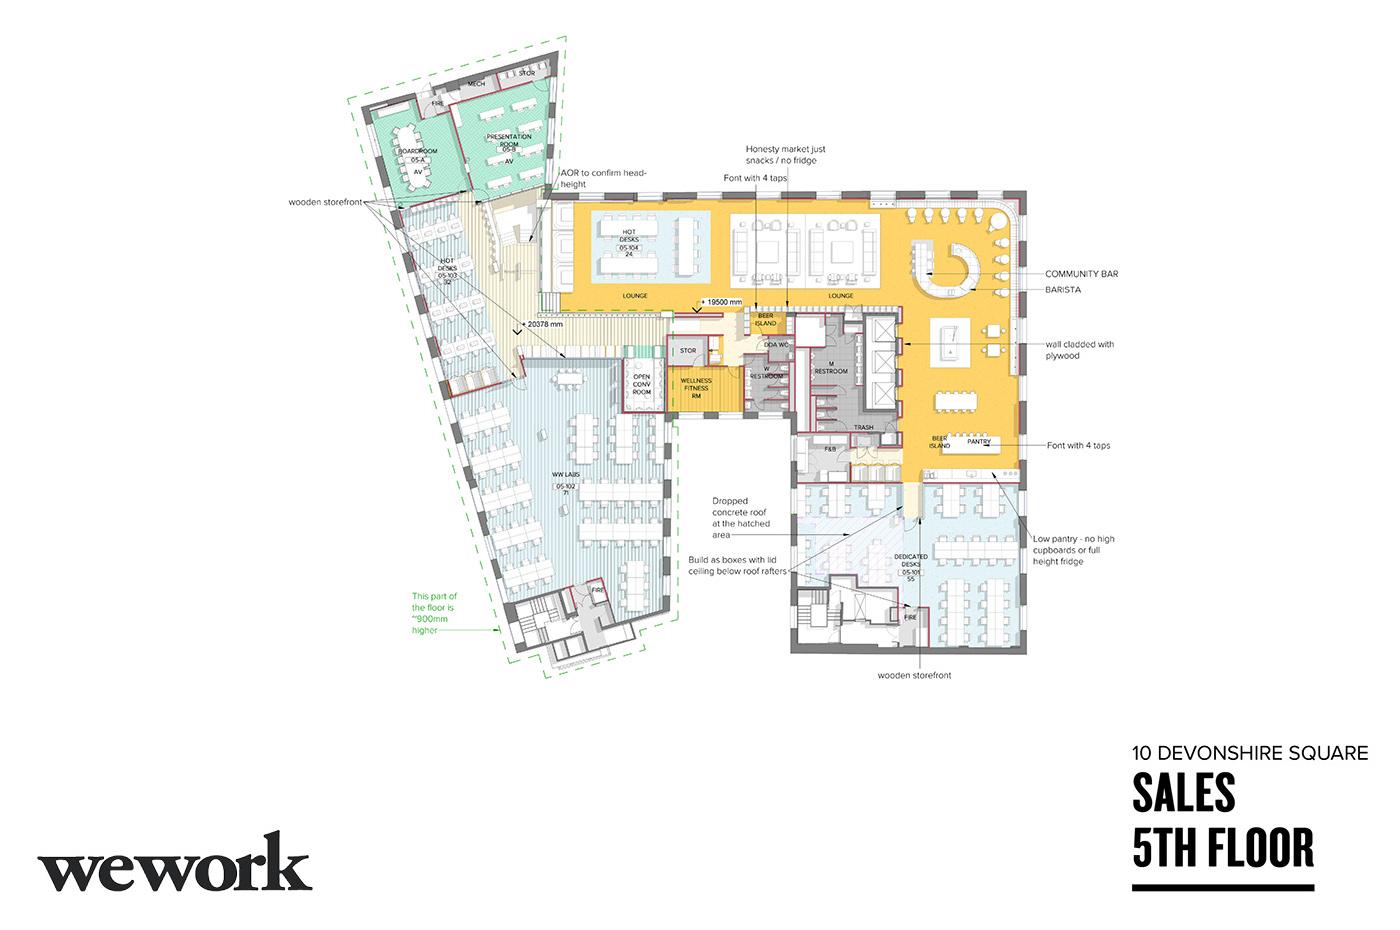 floorplans-17 copy.jpg